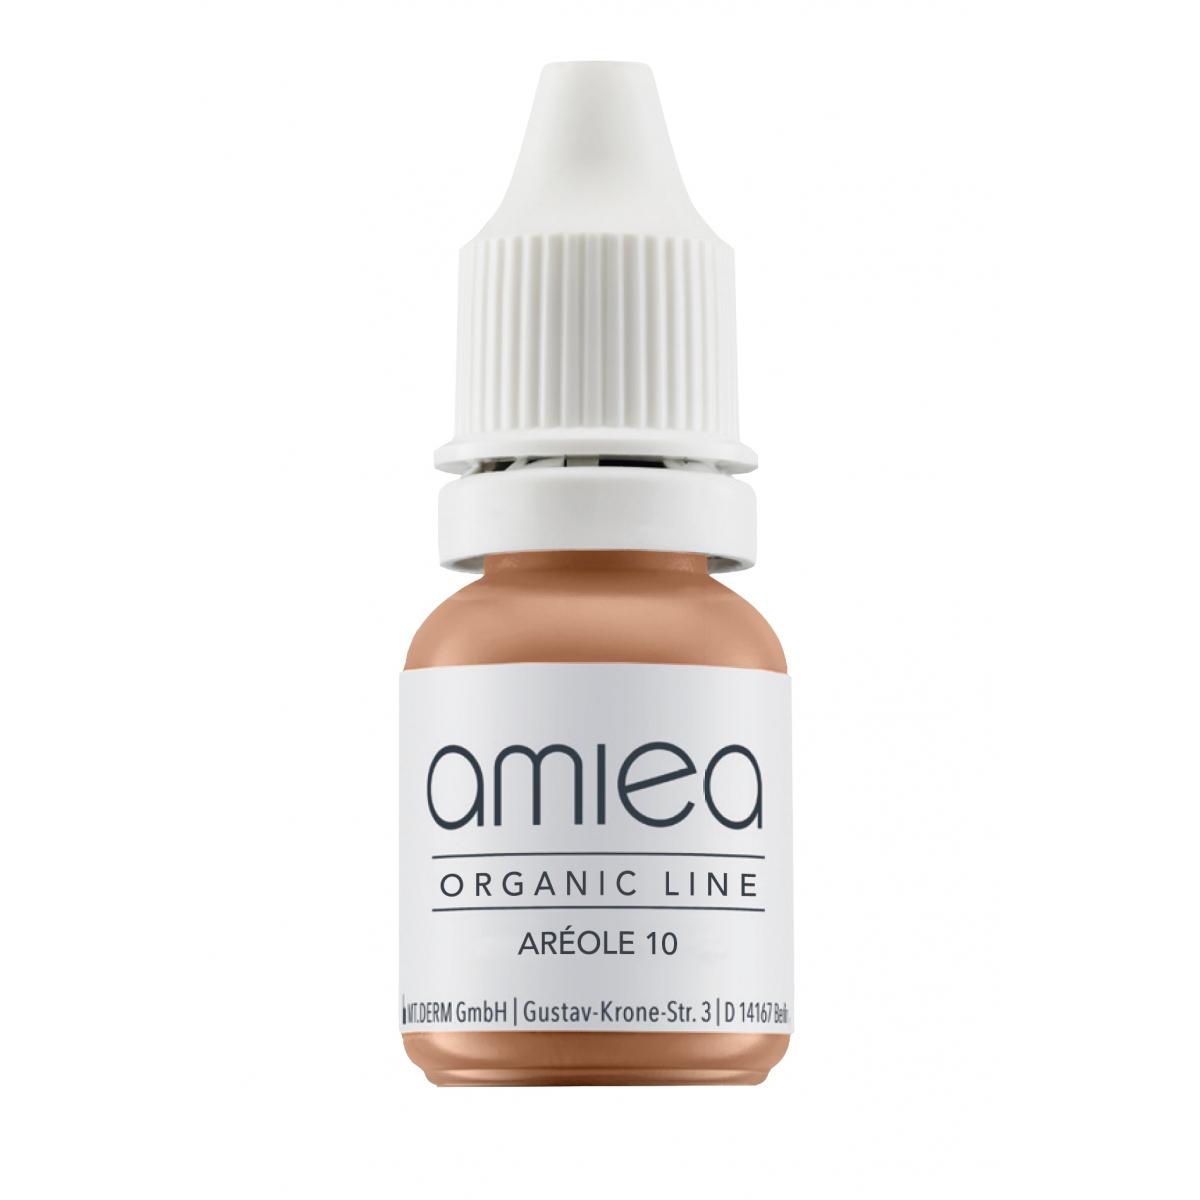 Organicline (10 ml) - PIGMENTS AMIEA ORGANICLINE AREOLES 10, Flacon 10 ml